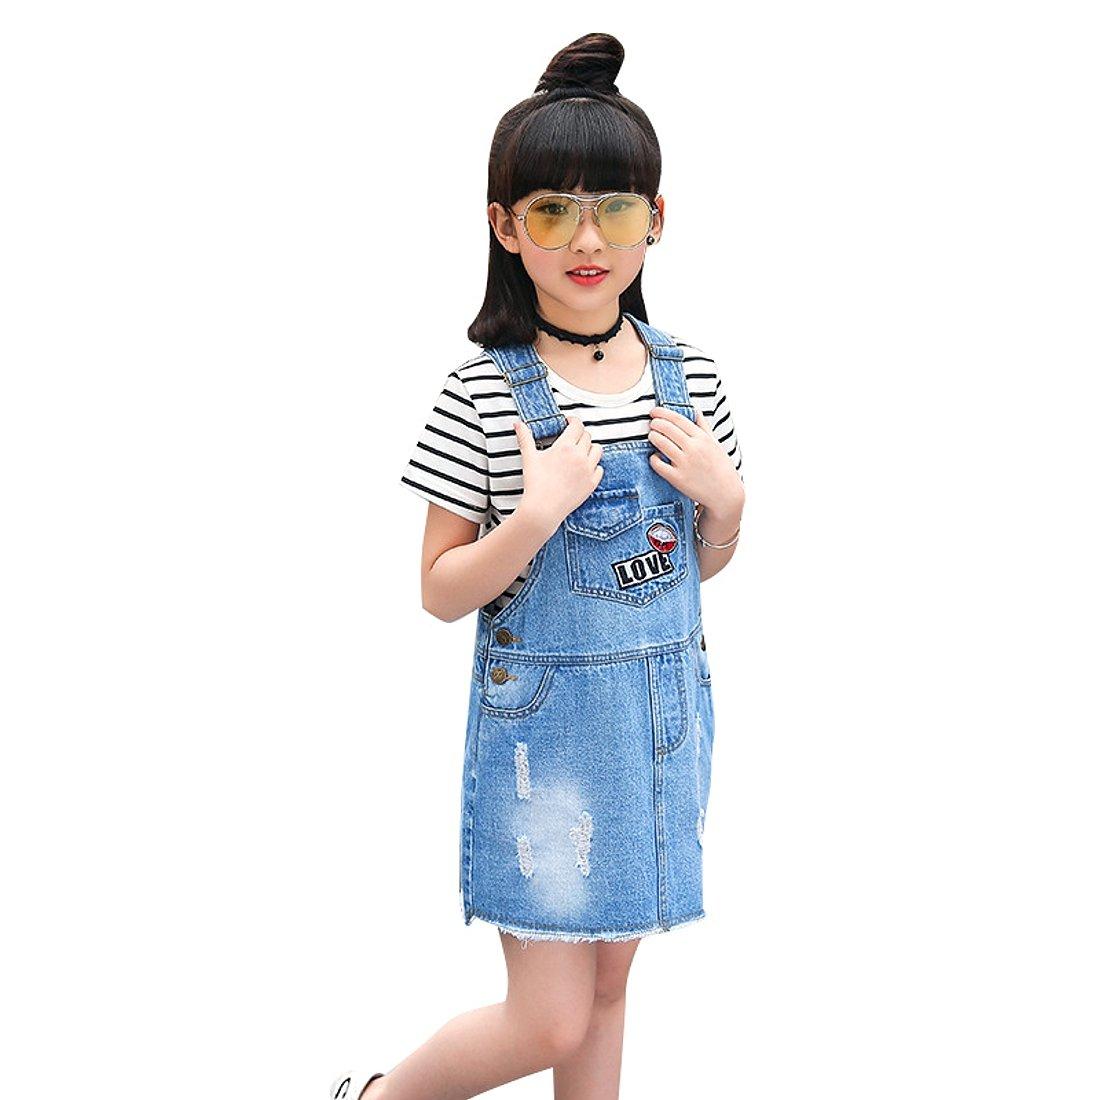 Kidscool Girls Big Bibs Raw Edge Love Lips Summer Overalls Dress,Blue,7-8 Years